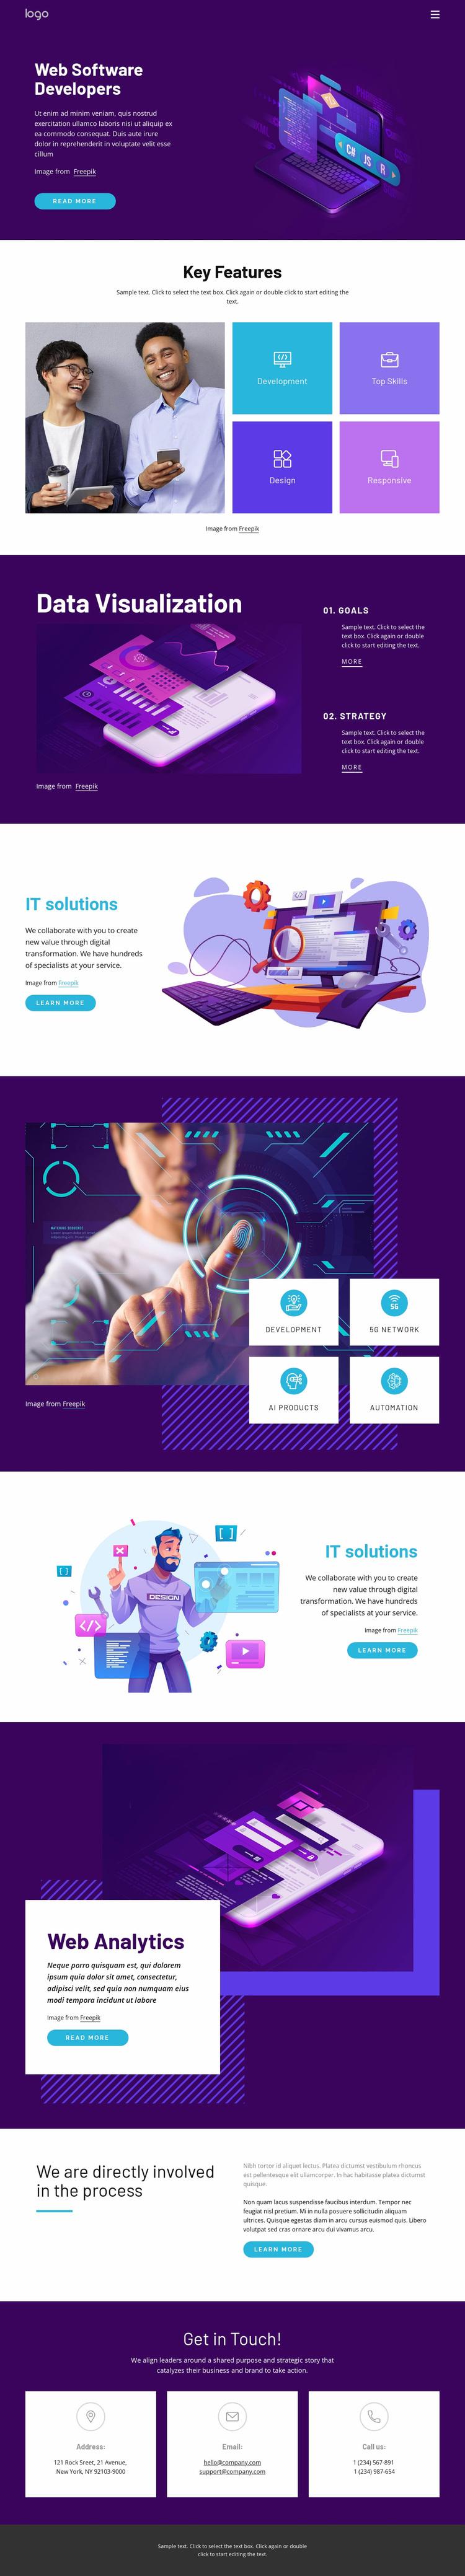 Solutions improve productivity Website Design